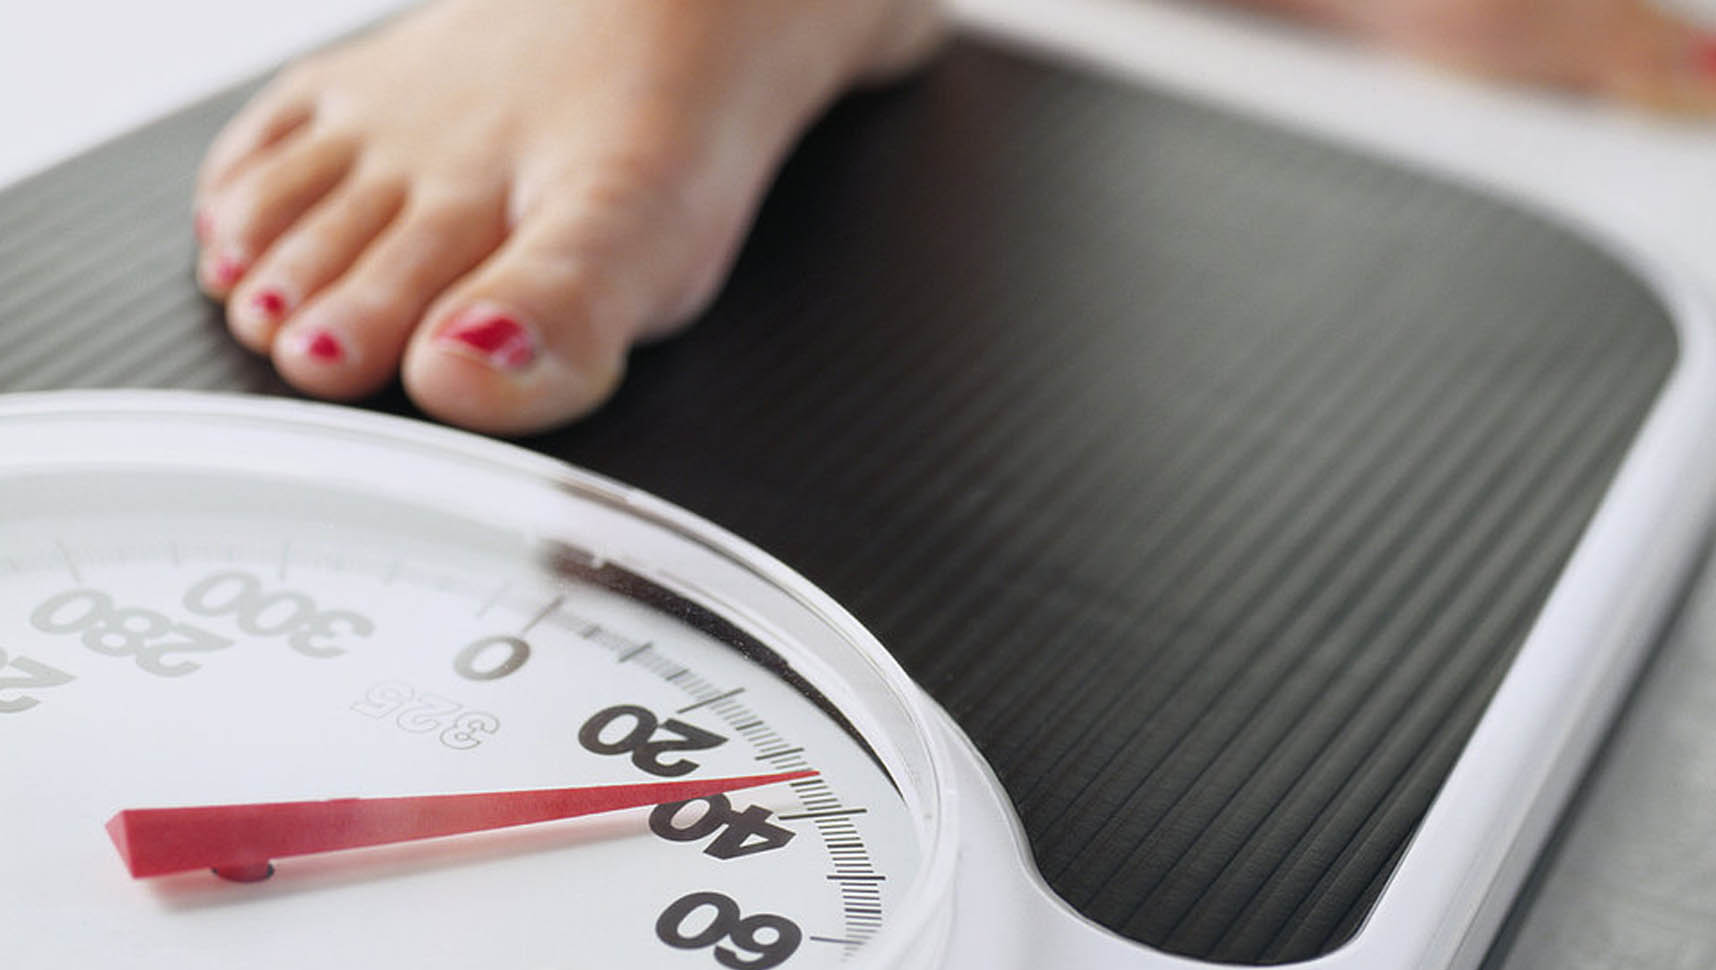 نقص الوزن